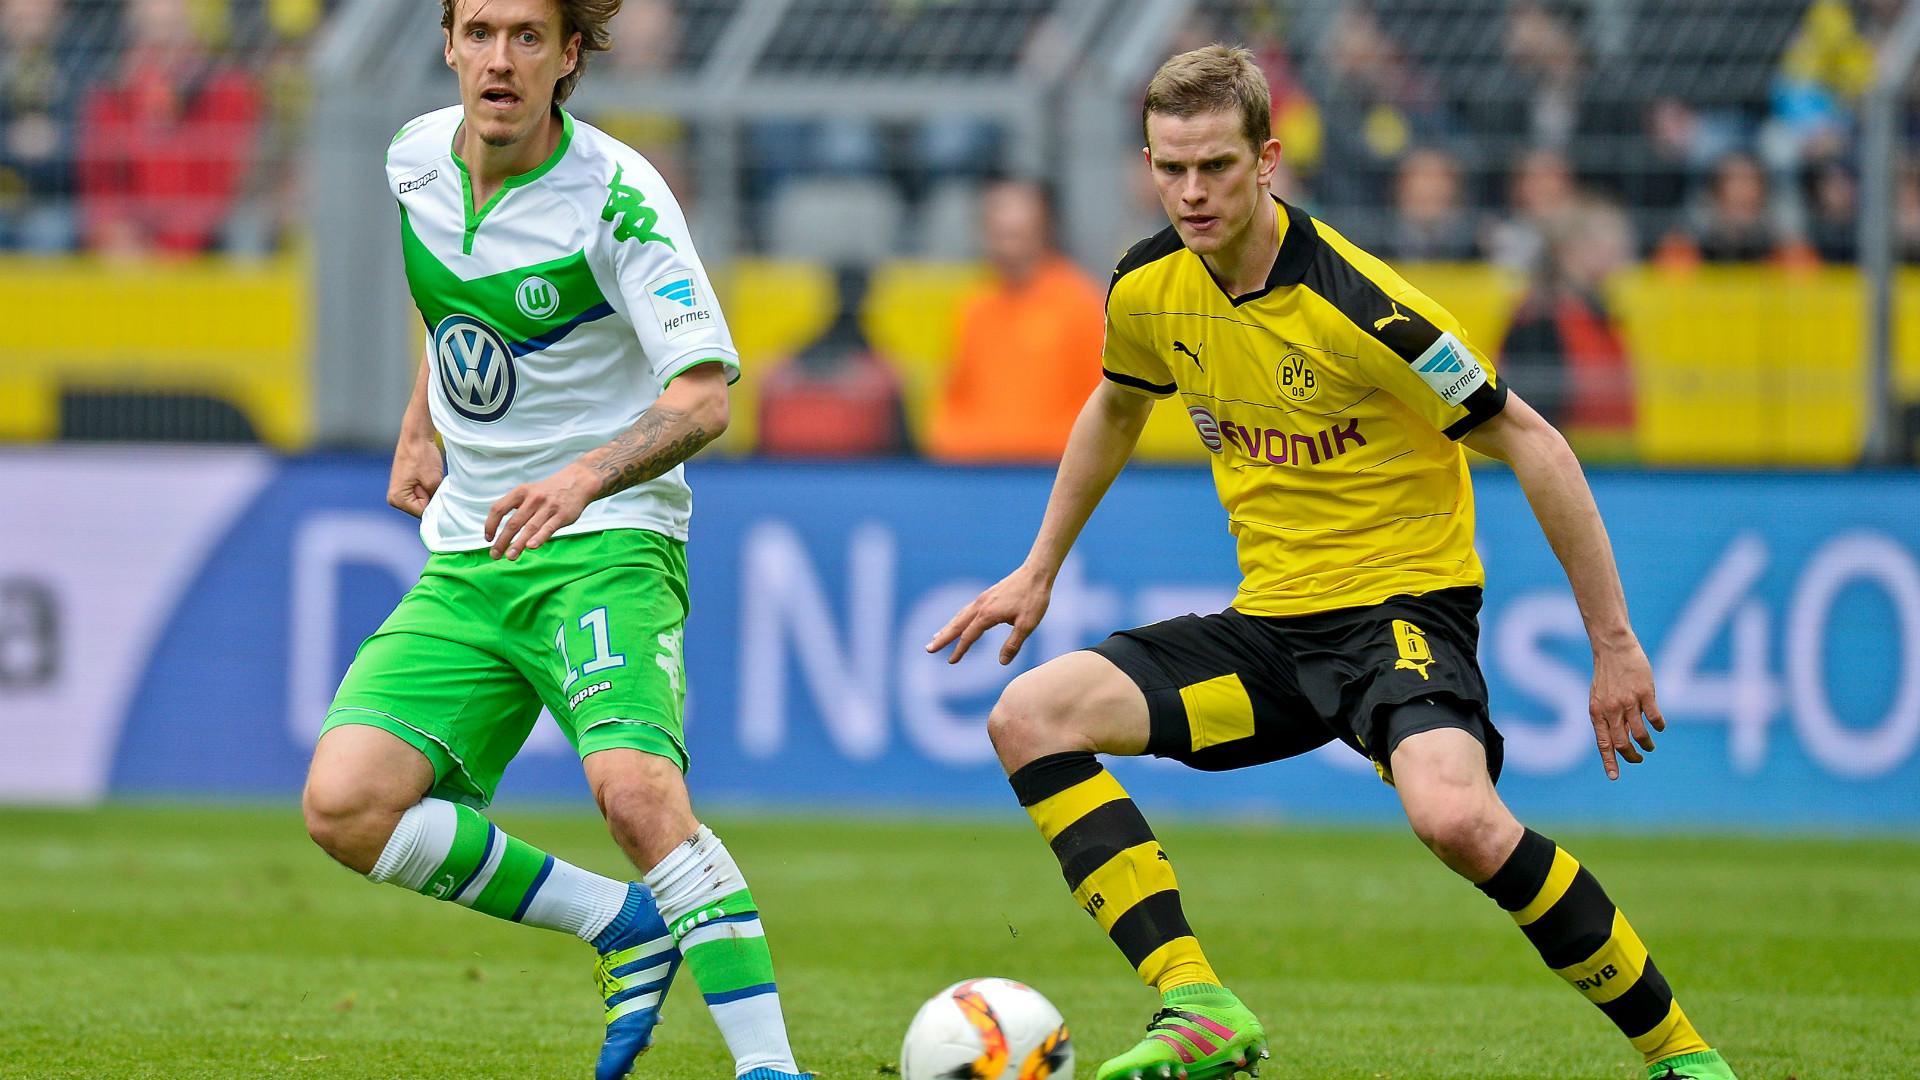 Sven Bender Borussia Dortmund Vfl Wolfsburg Max Kruse Bundesliga